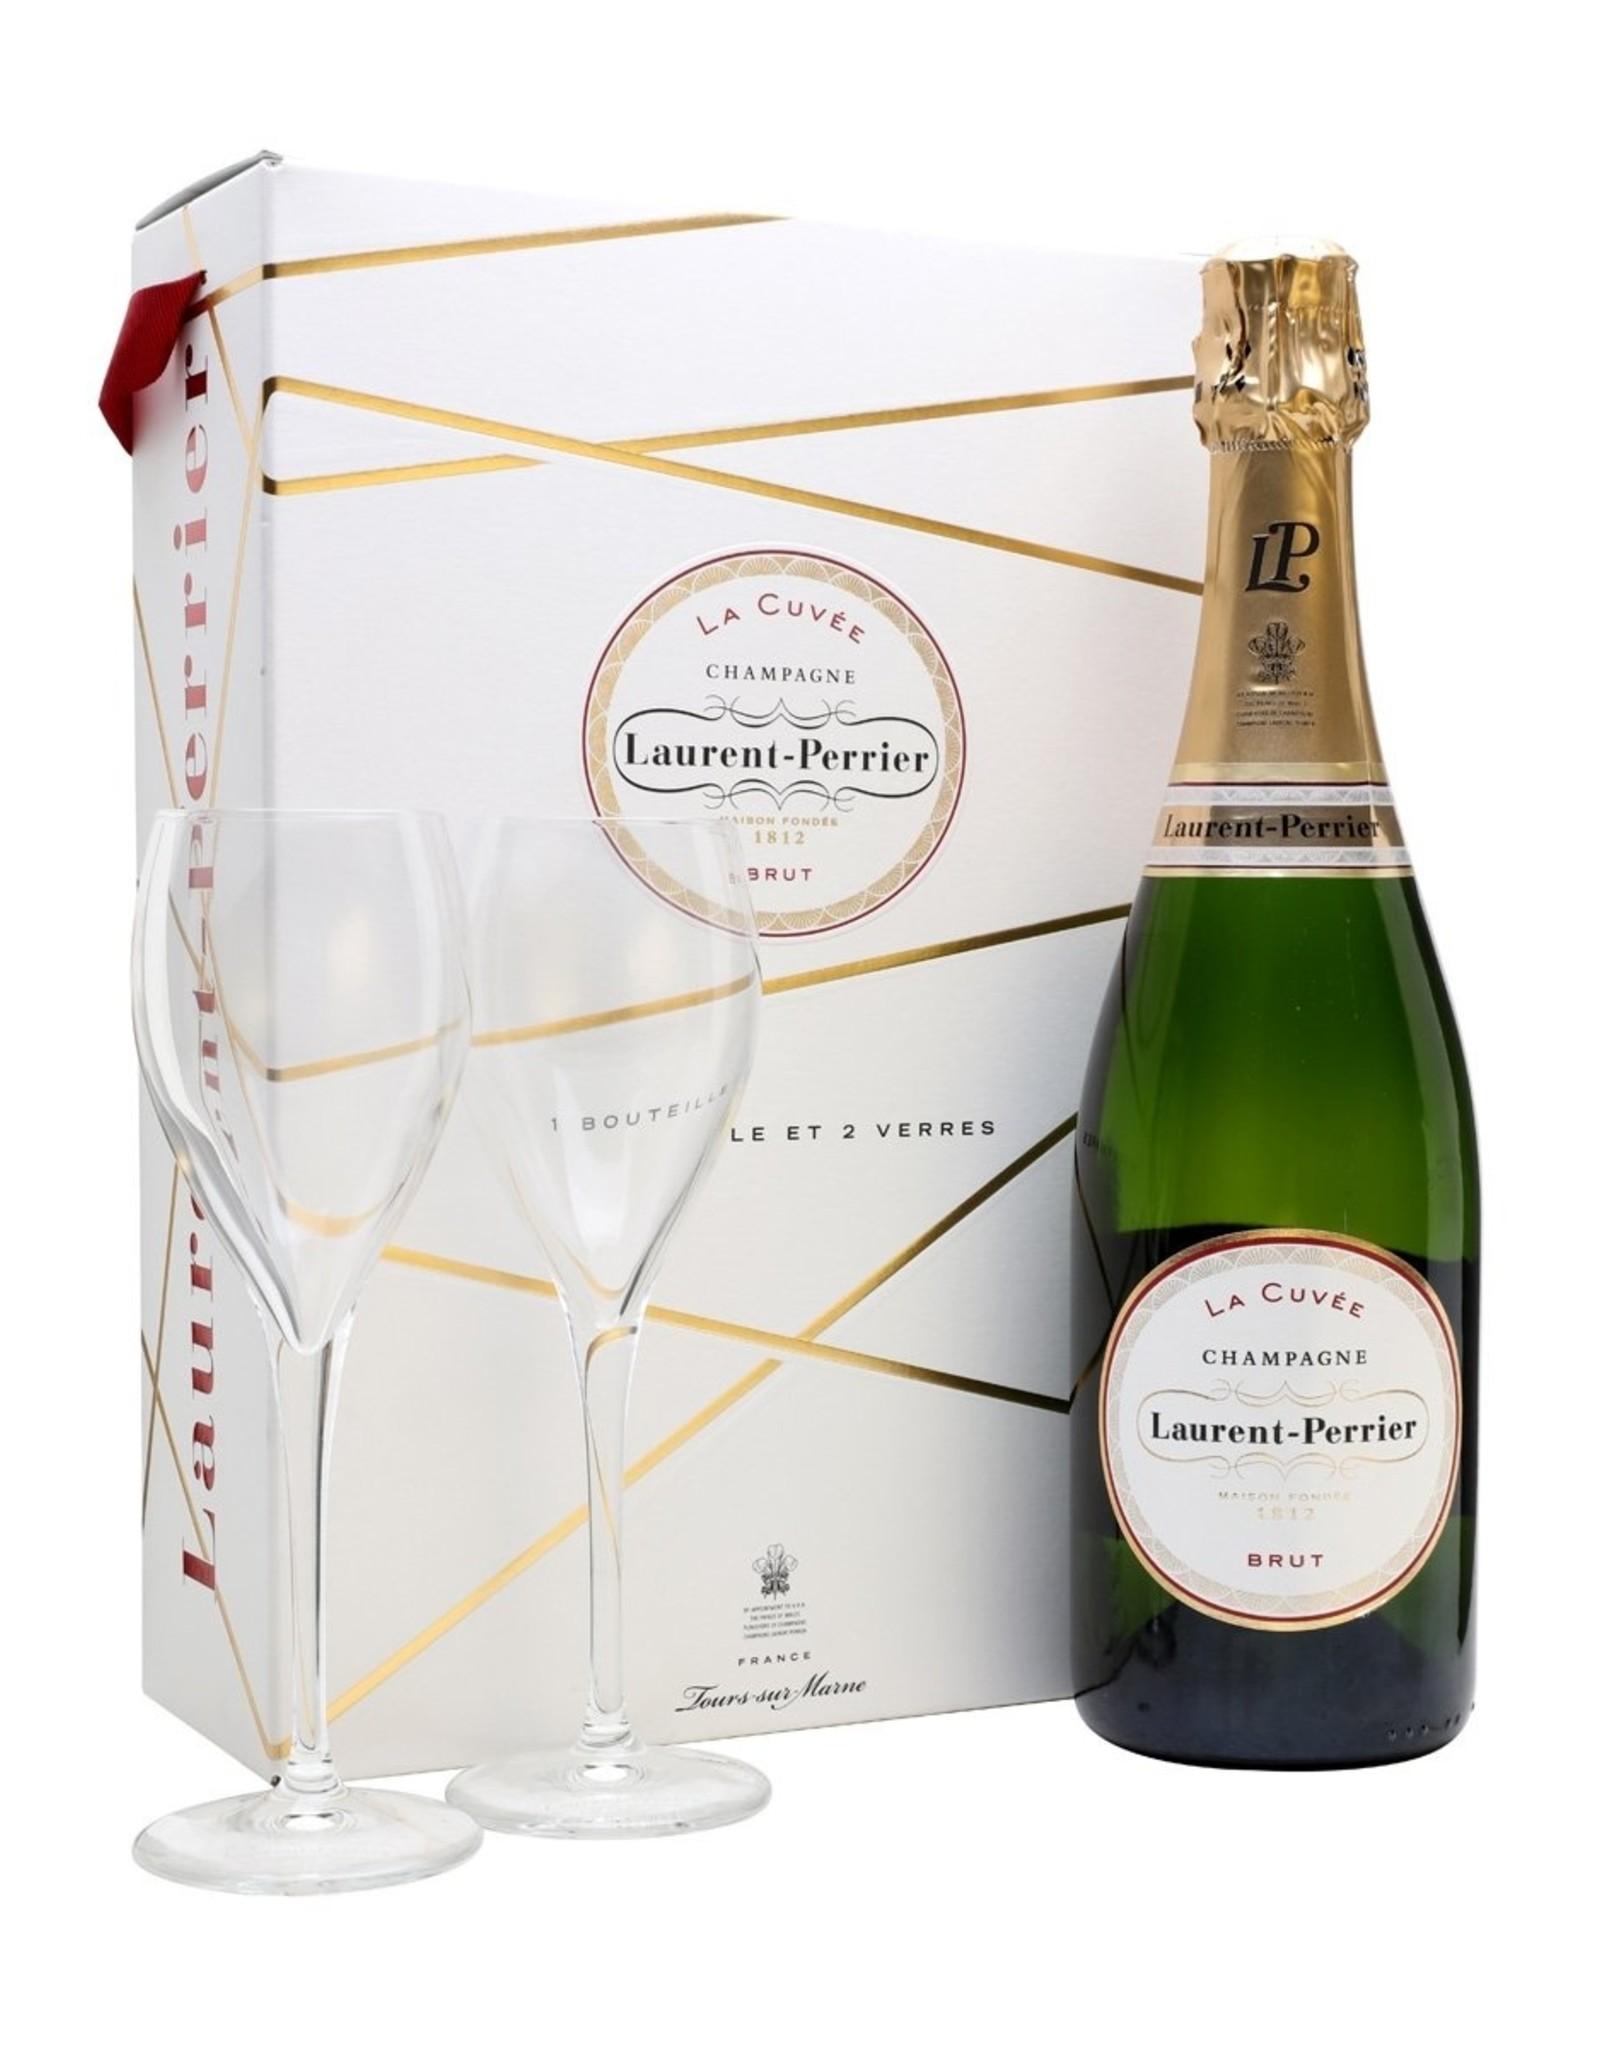 Laurent Perrier Brut Gift Set With Glasses